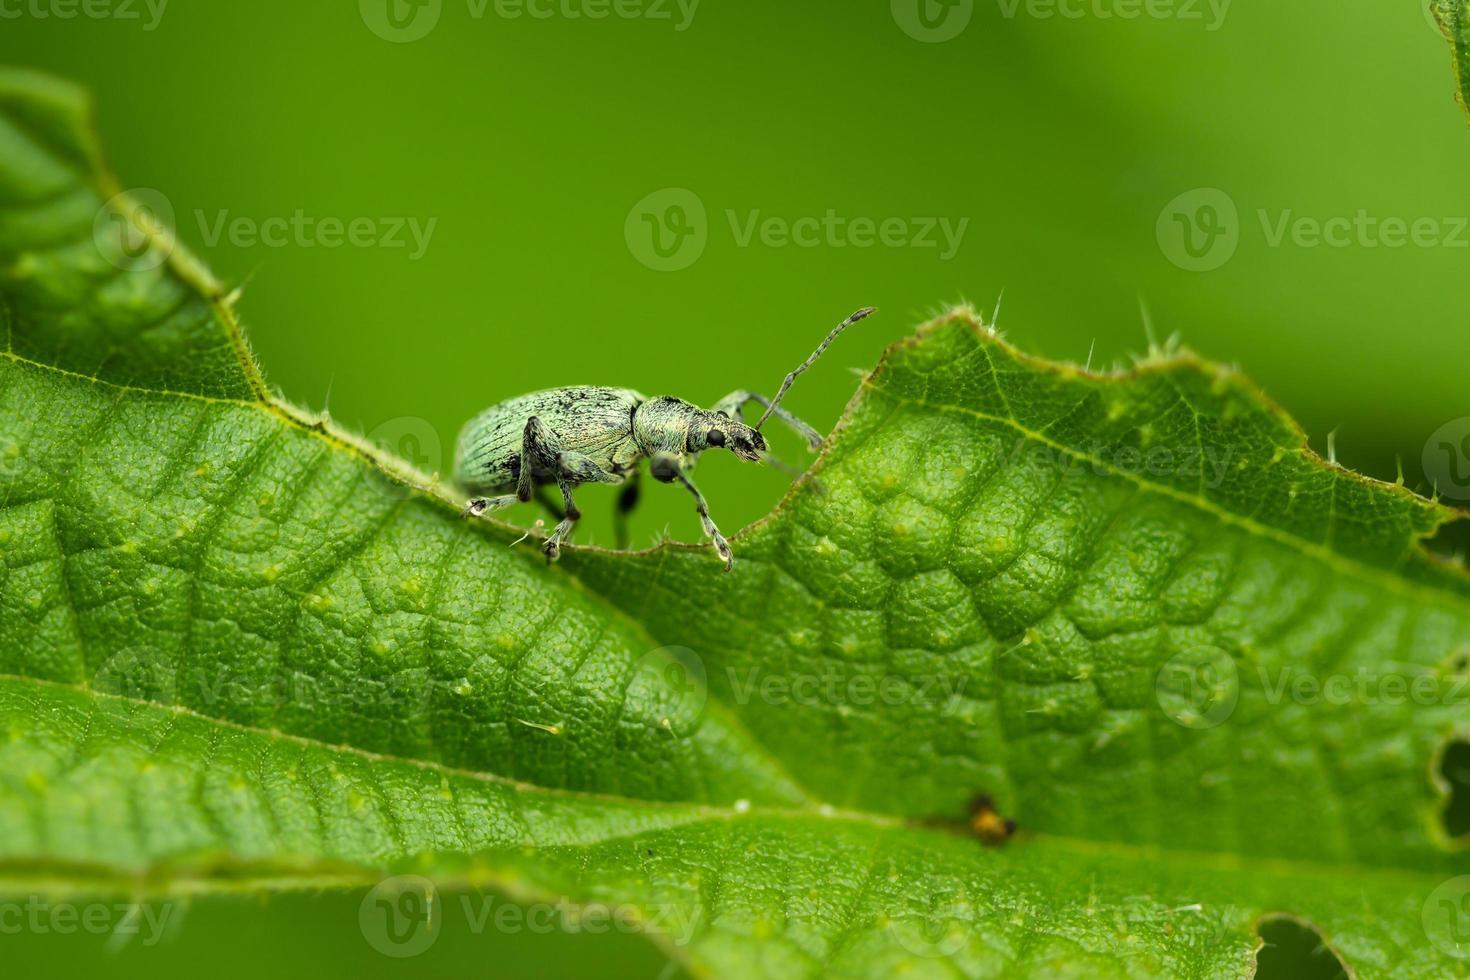 Rüsselkäfer auf Blatt foto